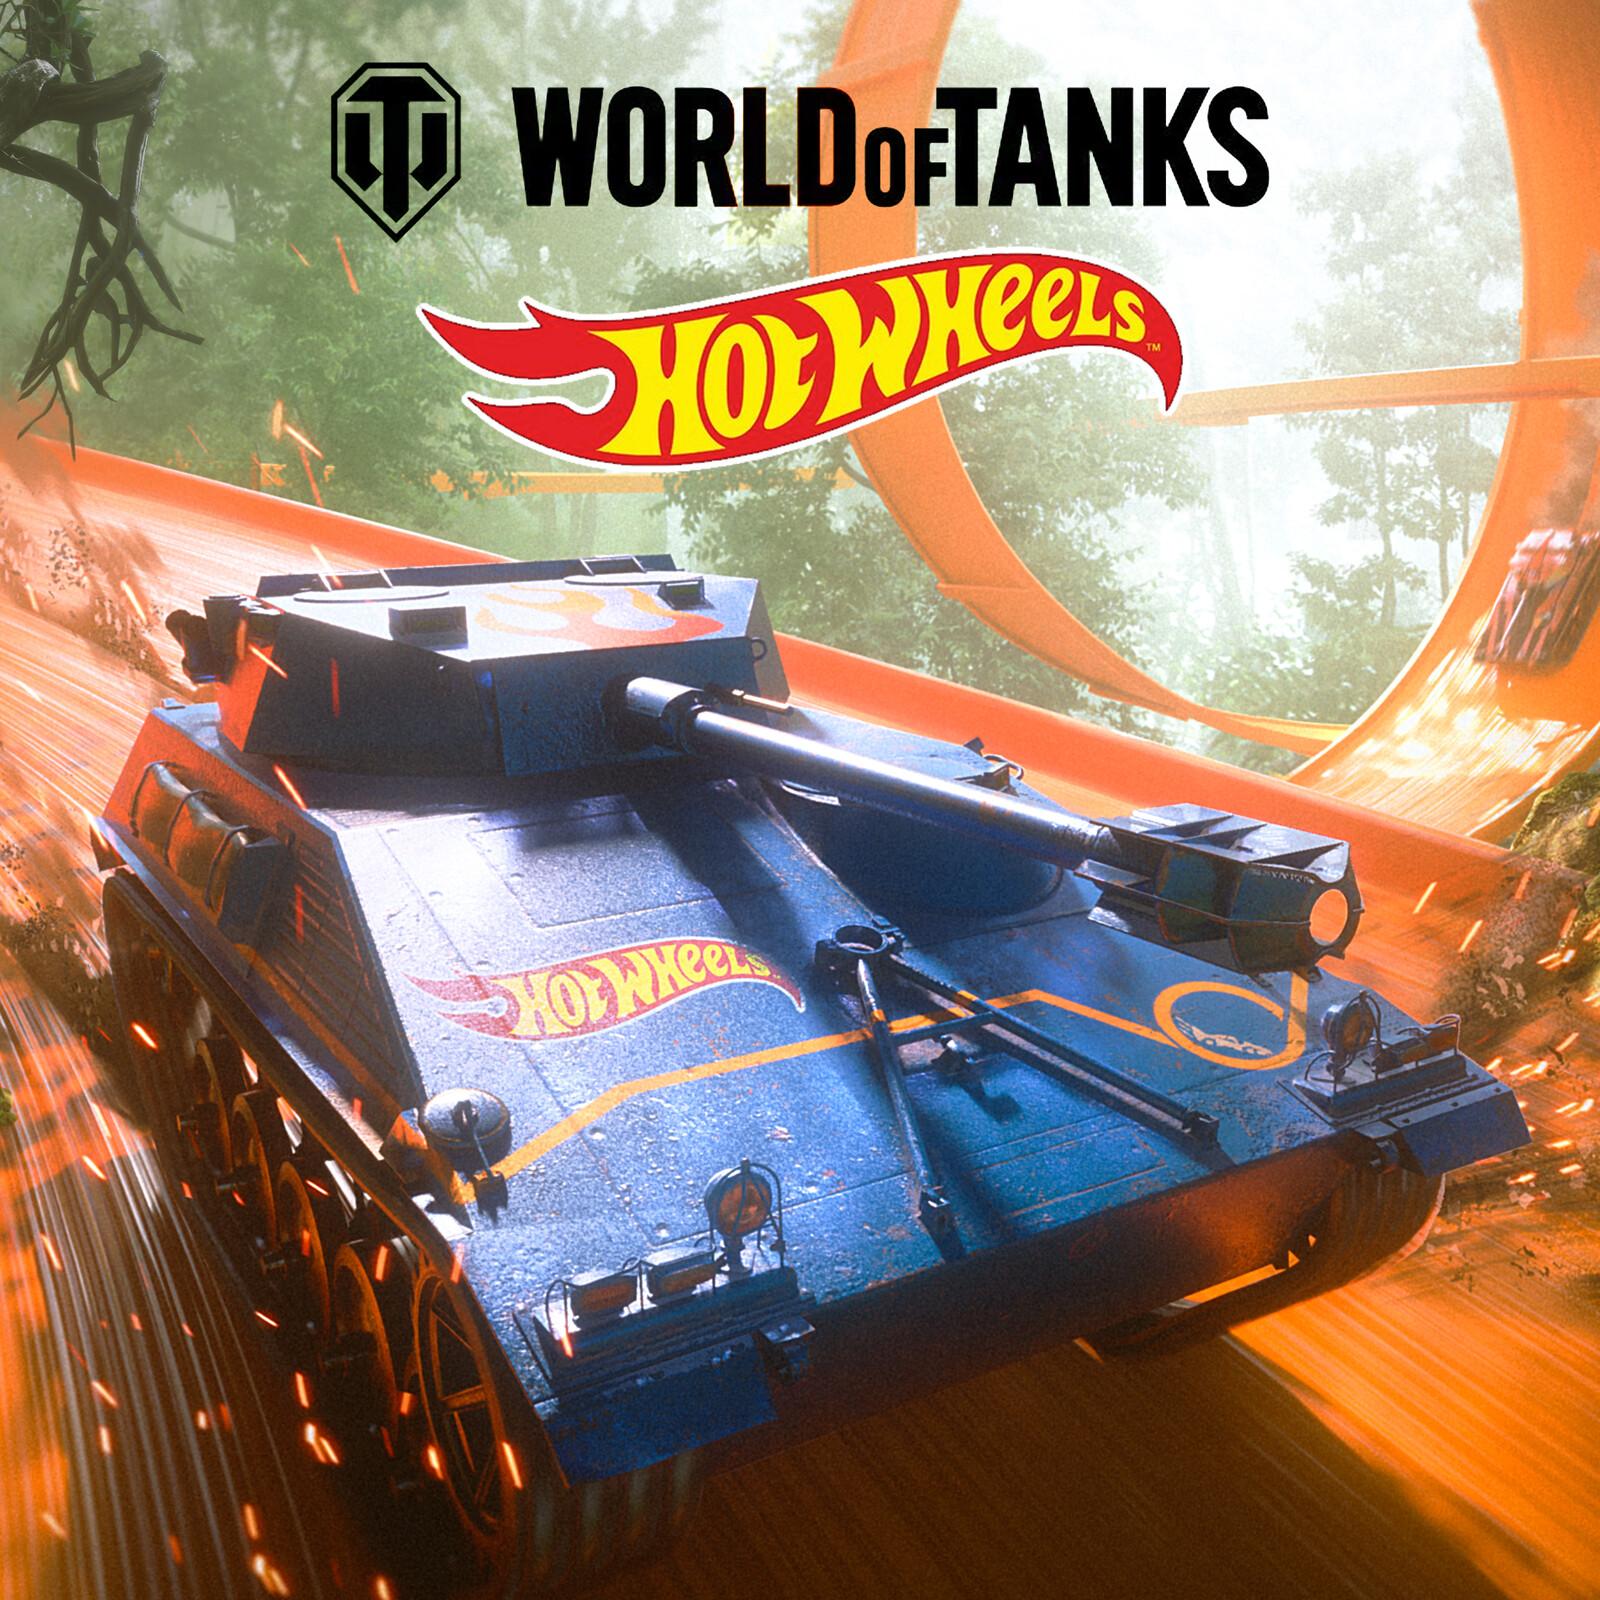 World of Tanks - Hot Wheels Promotional Art